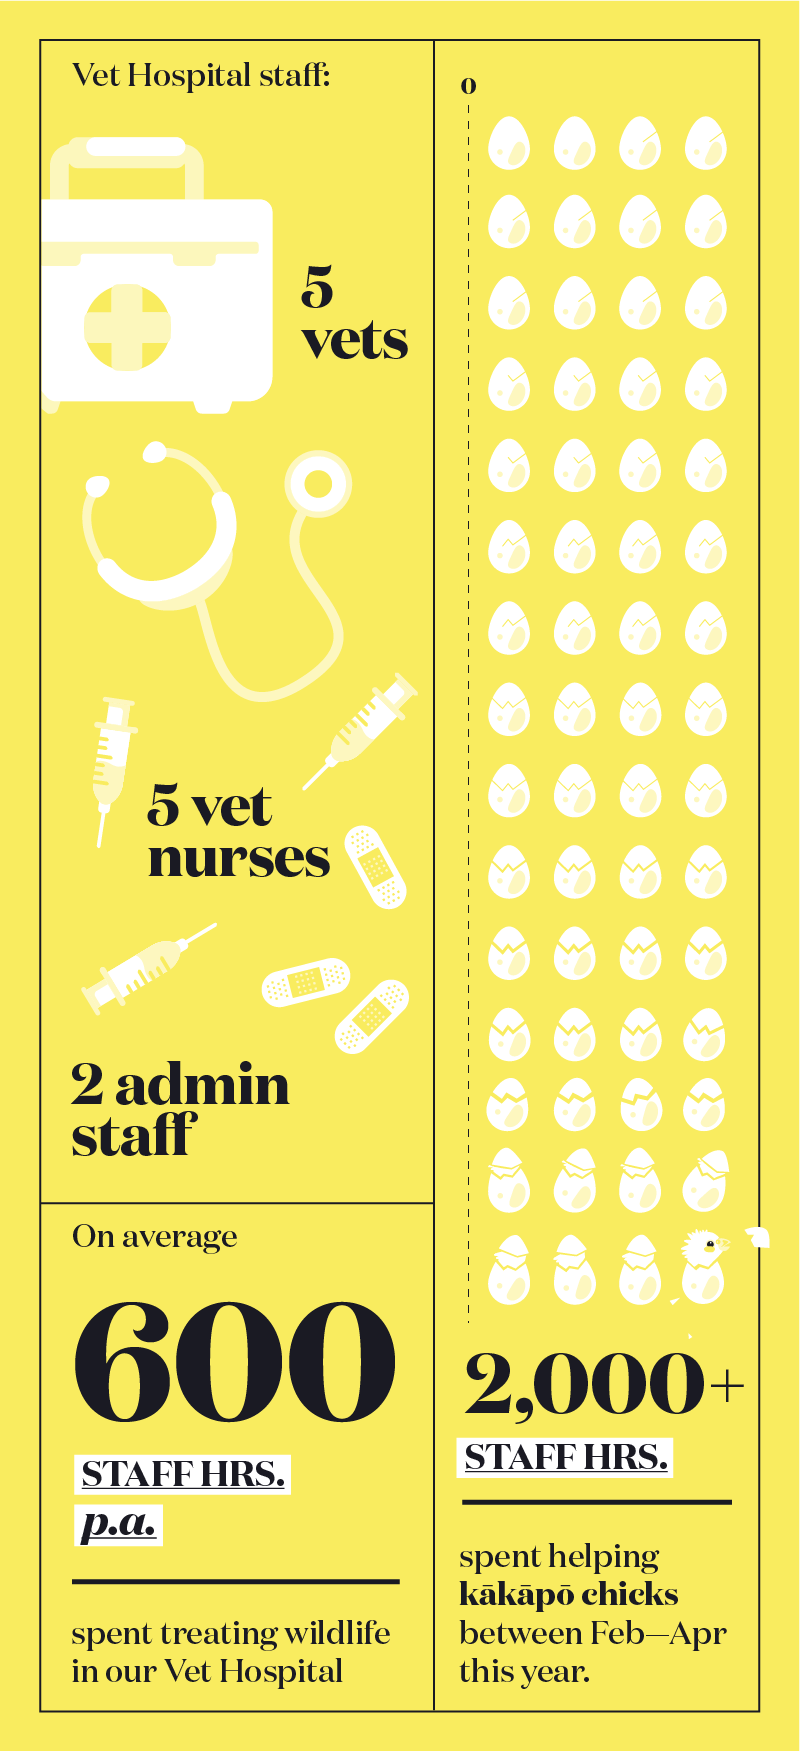 https://rfacdn.nz/zoo/assets/media/infographic-vet-hospital.png